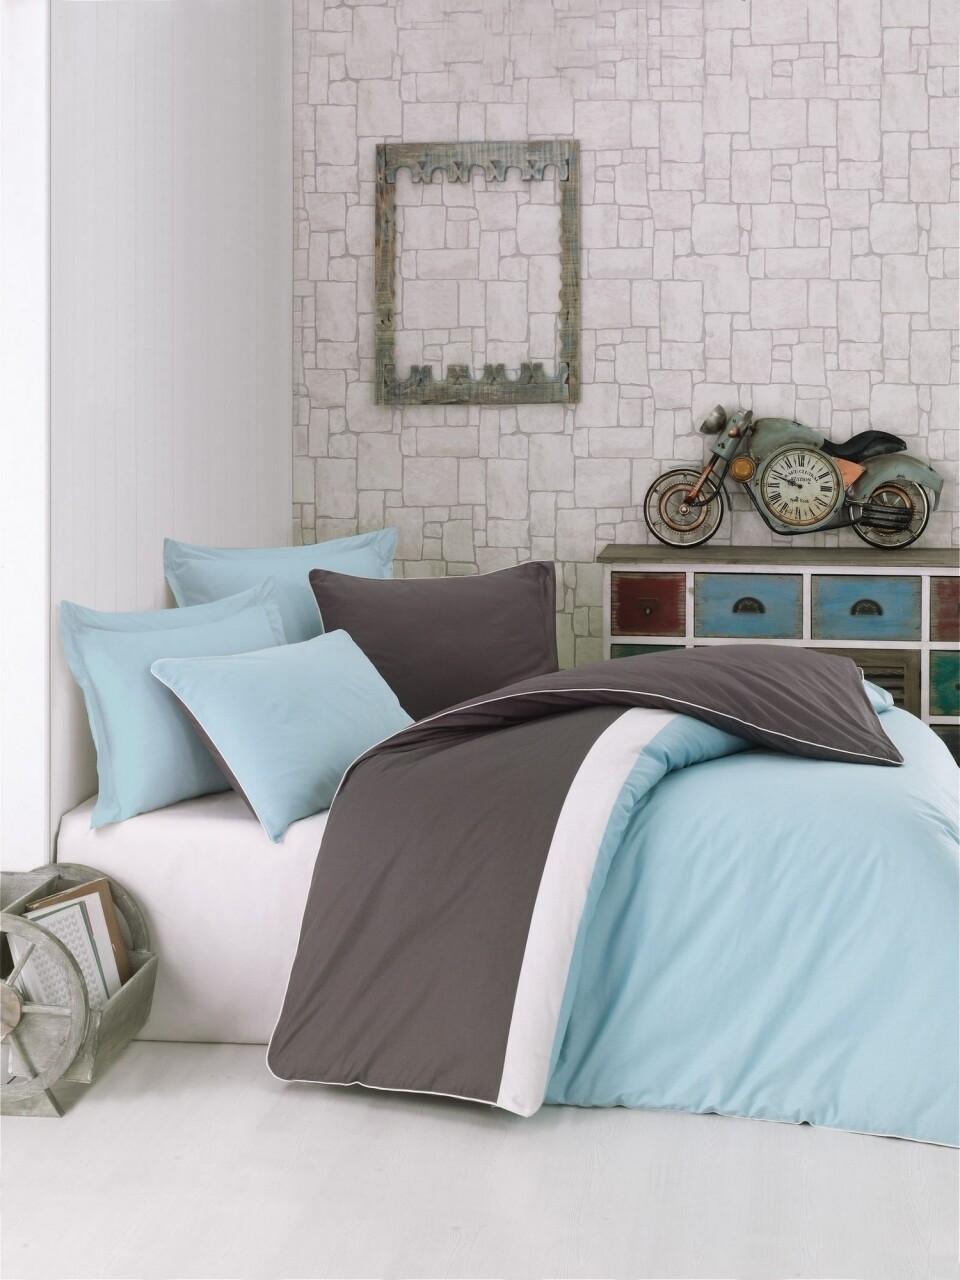 Lenjerie de pat pentru o persoana, 3 piese, 100% bumbac ranforce, Cotton Box, Plain Sport Mint